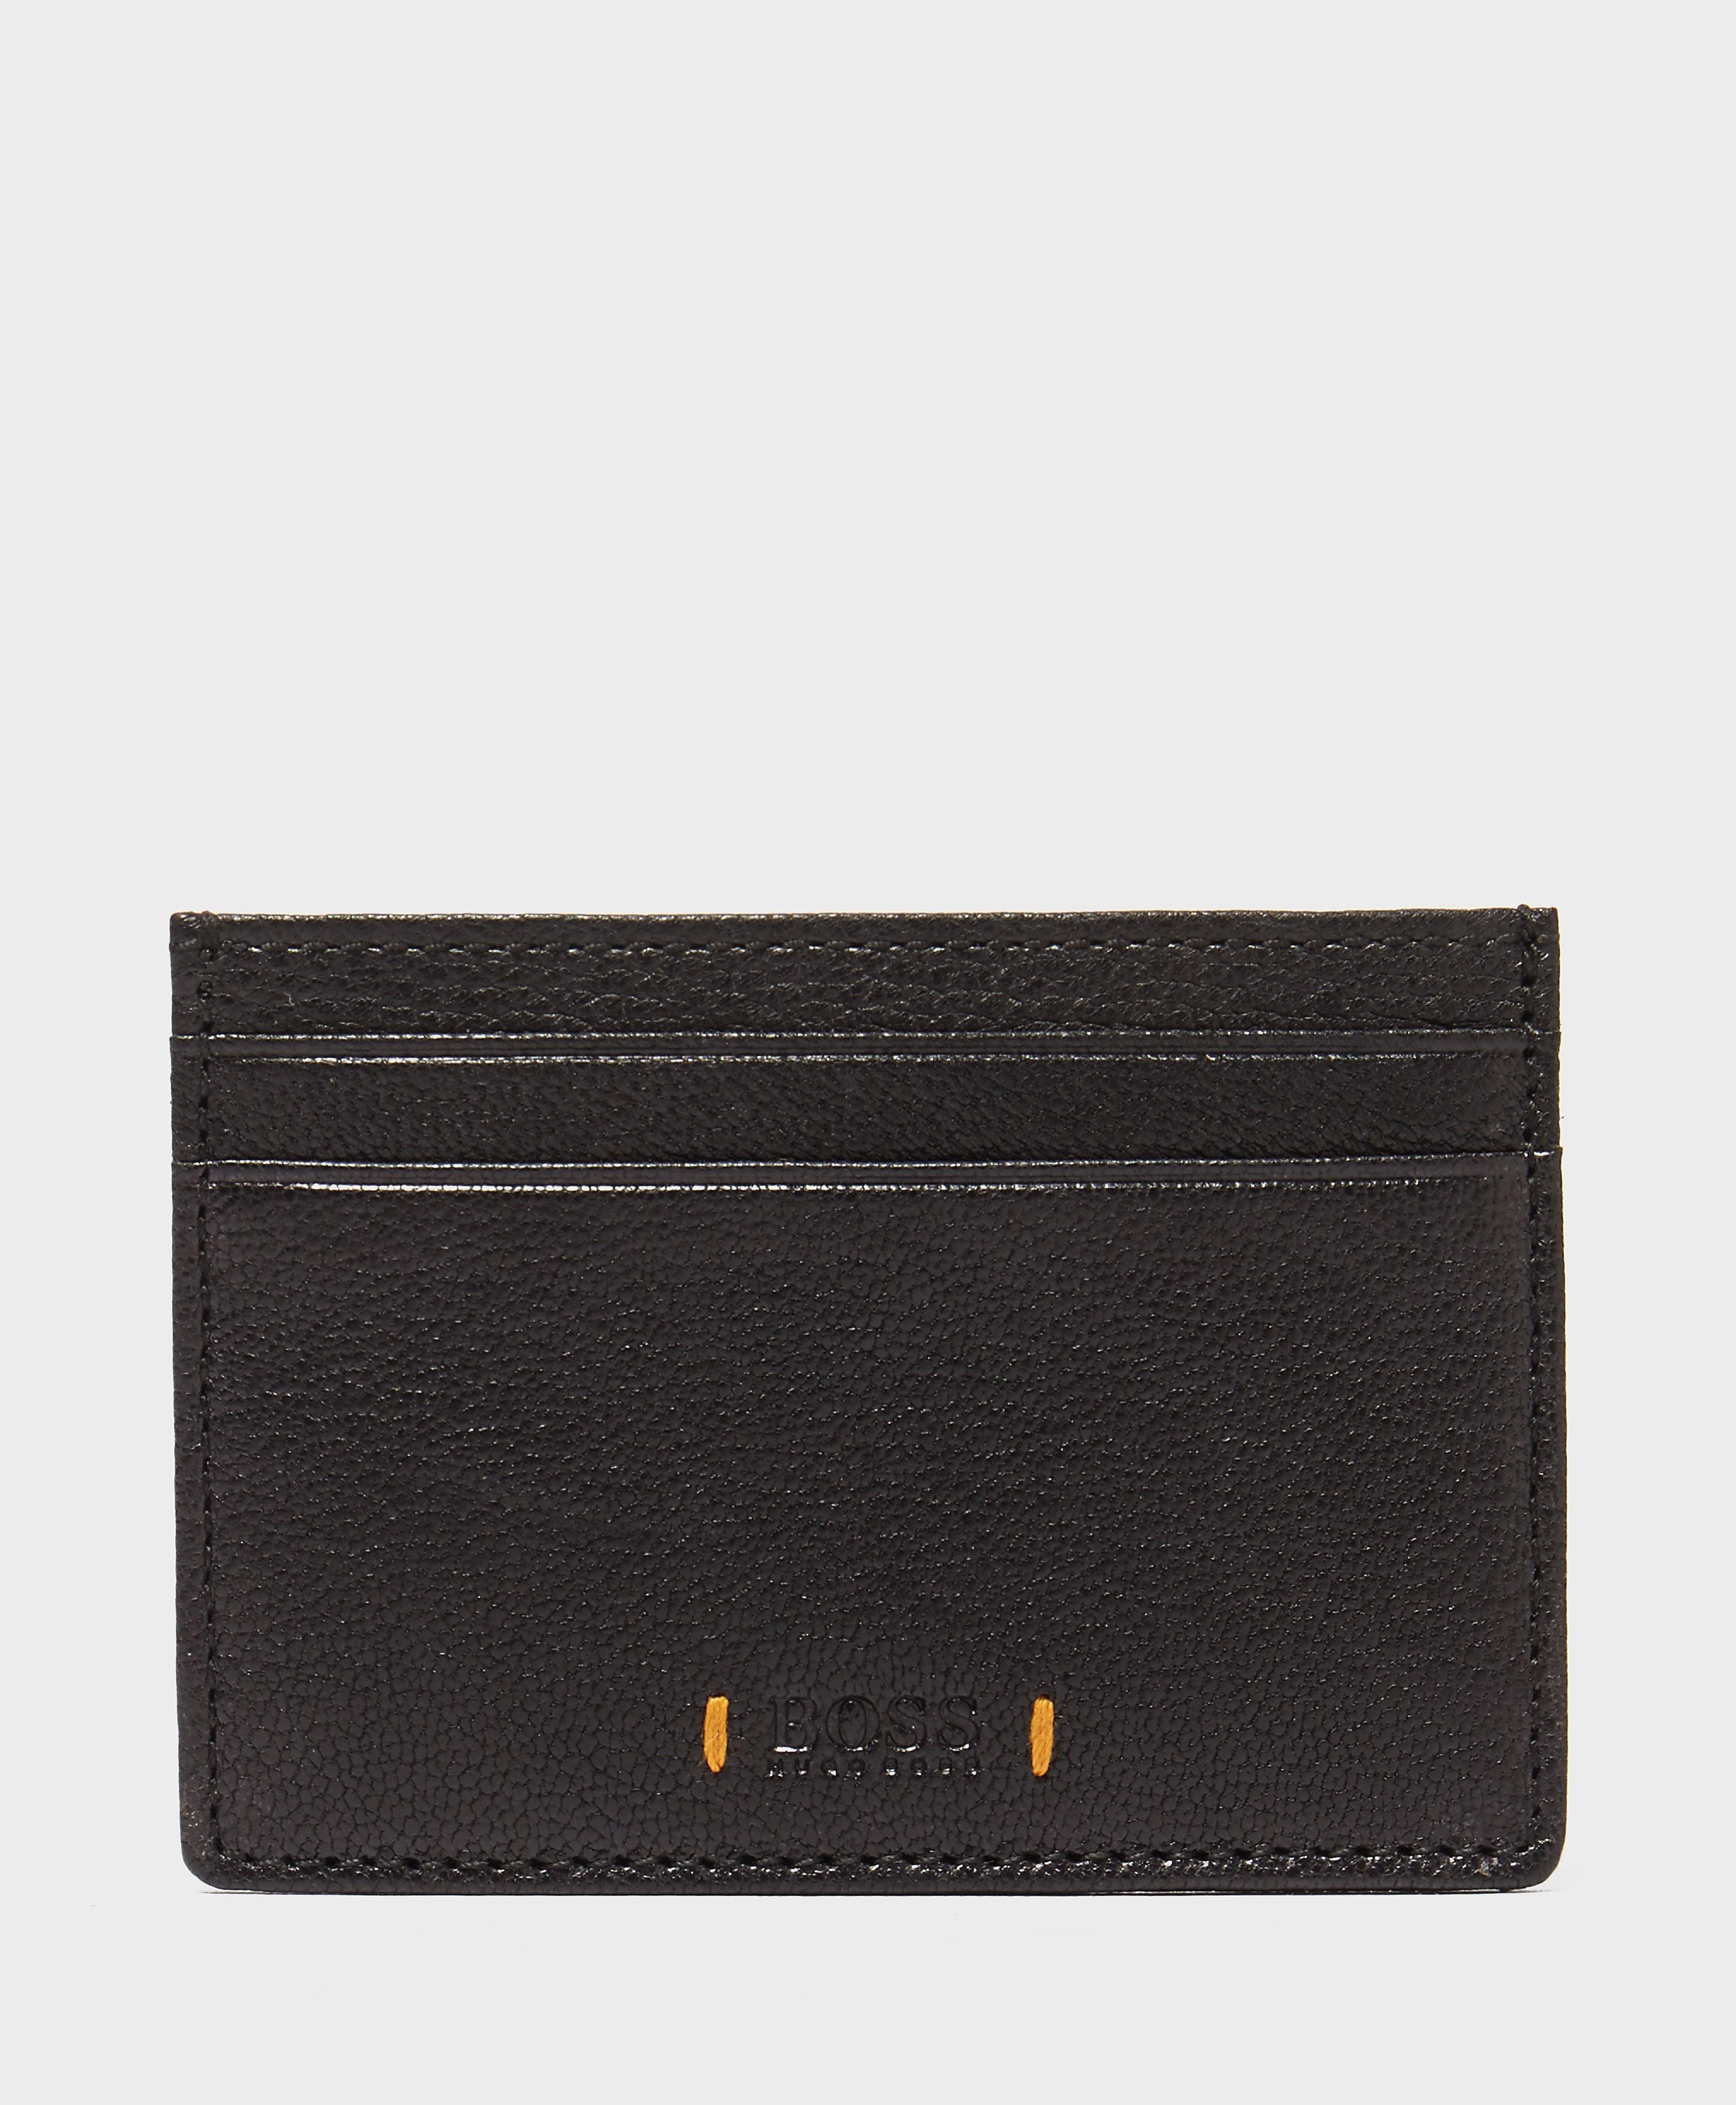 BOSS Orange Leather Card Case